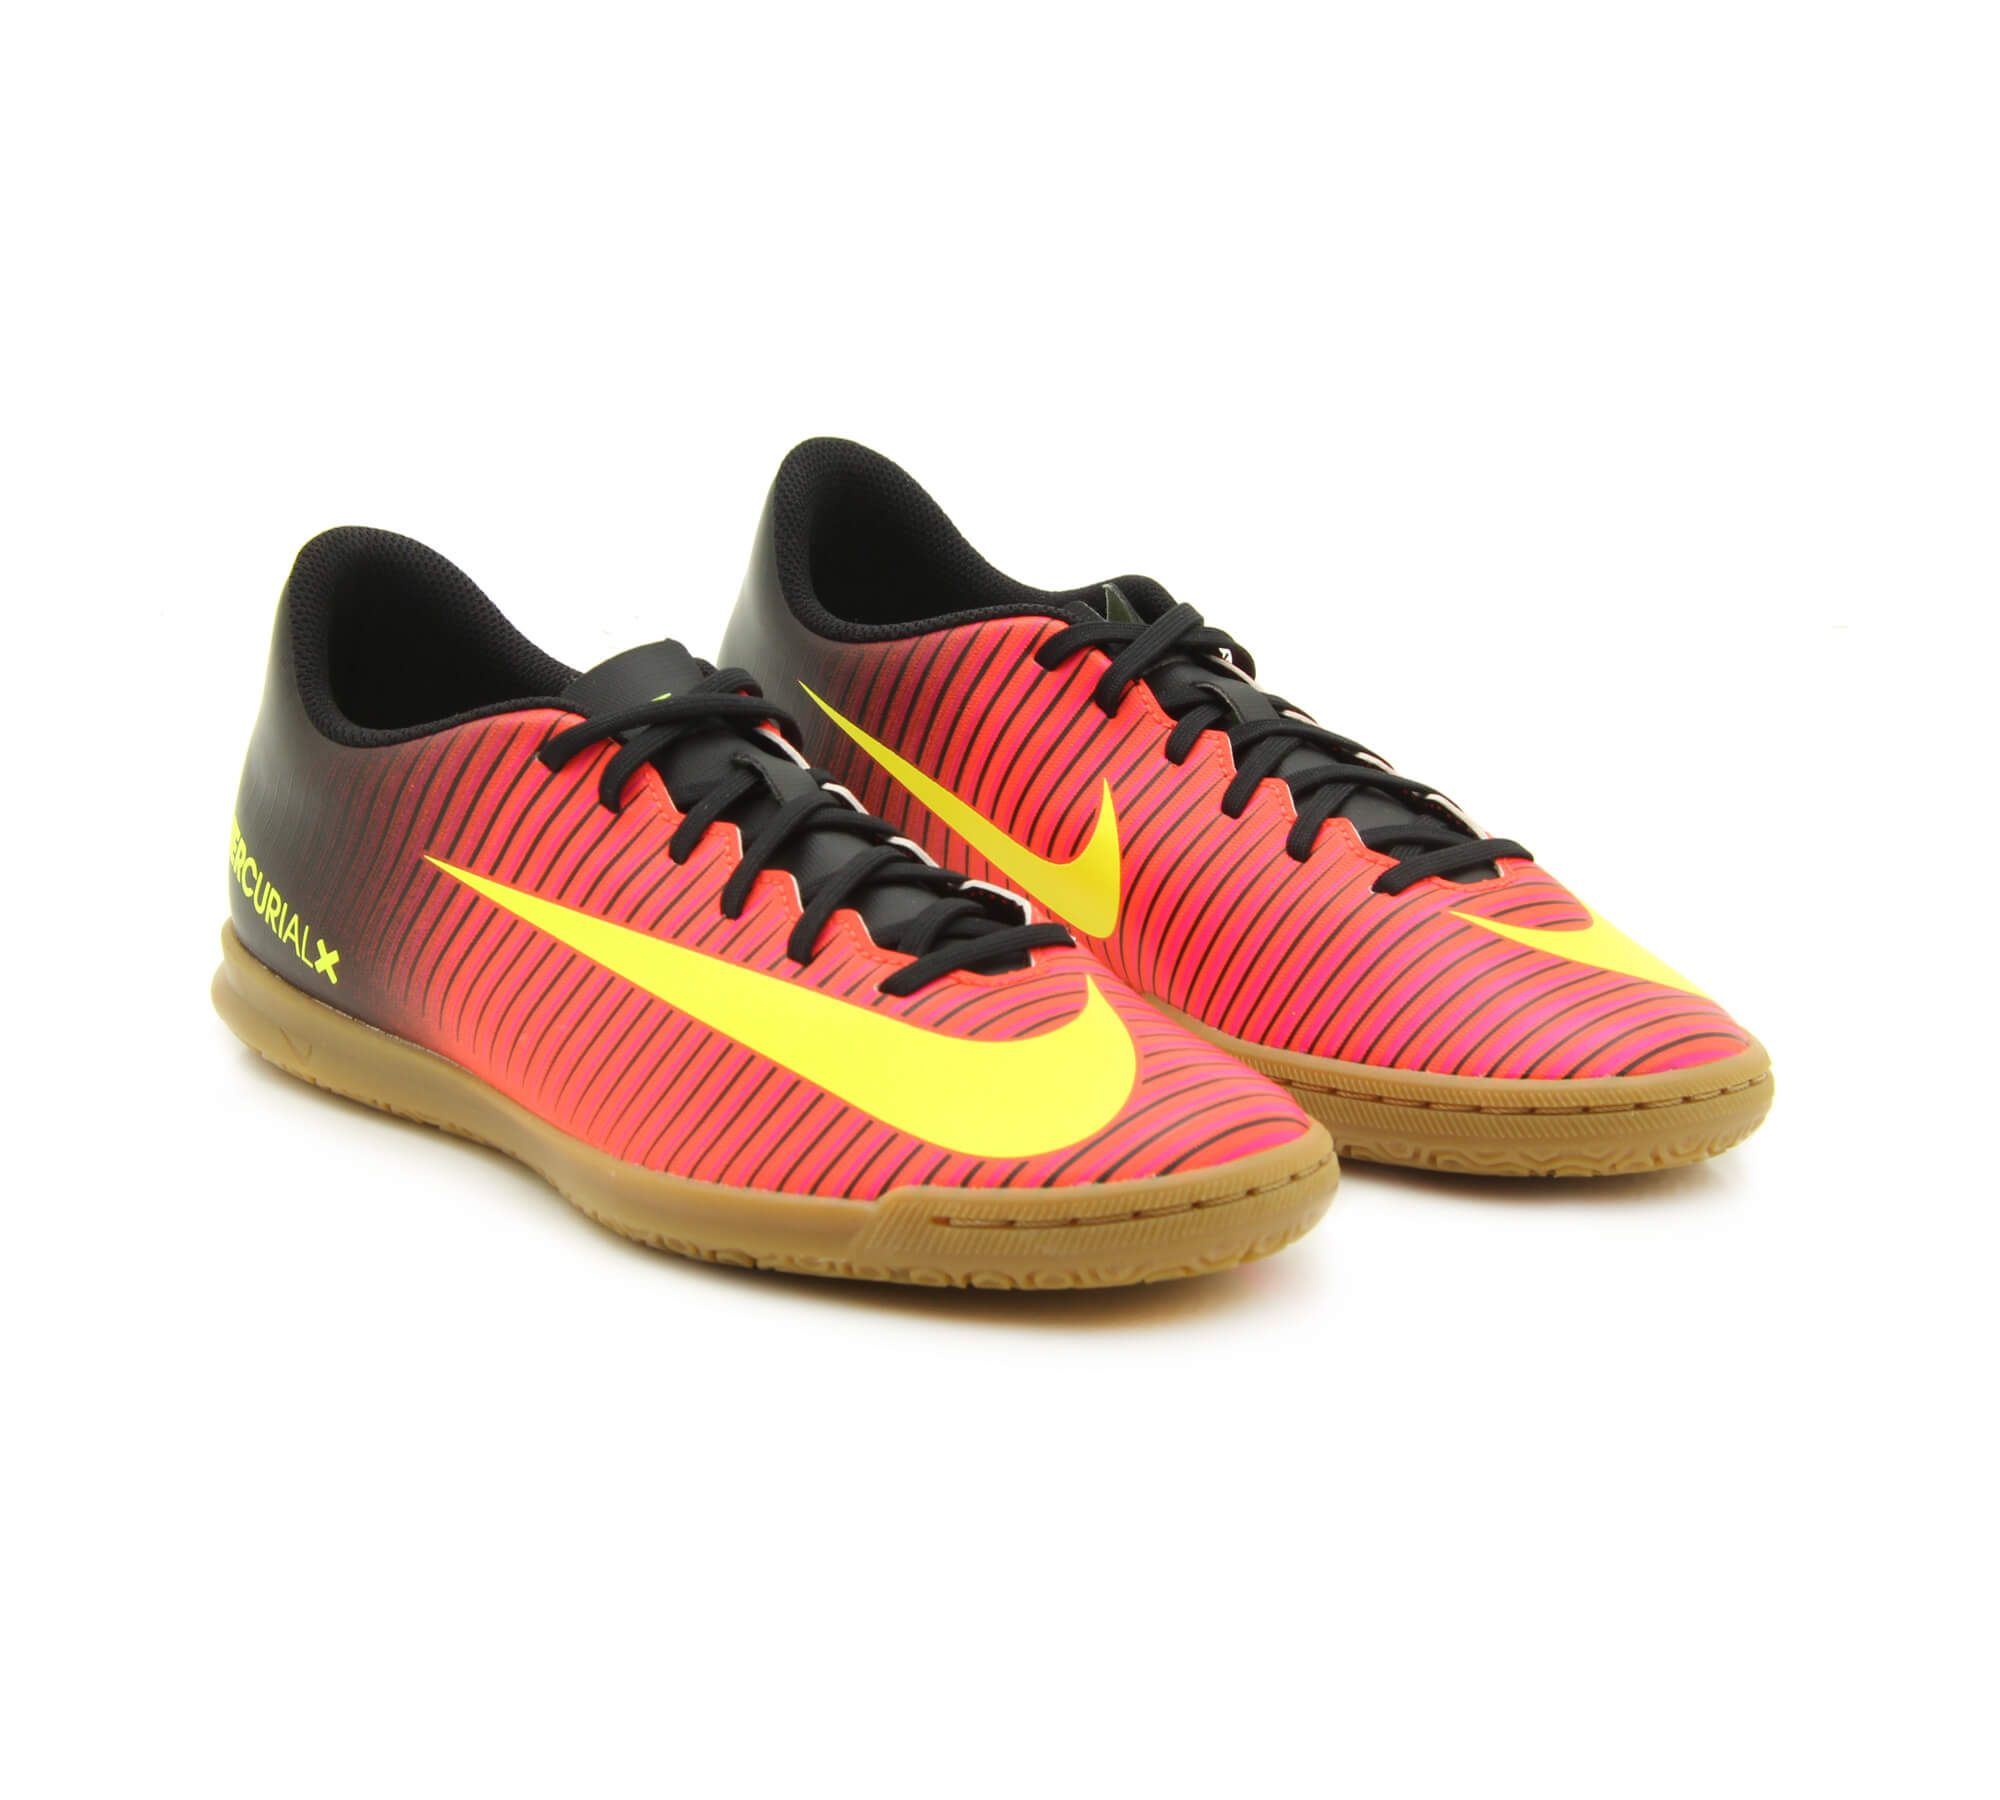 Chuteira De Futsal Nike Mercurial Vortex 3 IC - BRACIA SHOP  Loja de ... a5f015a959327